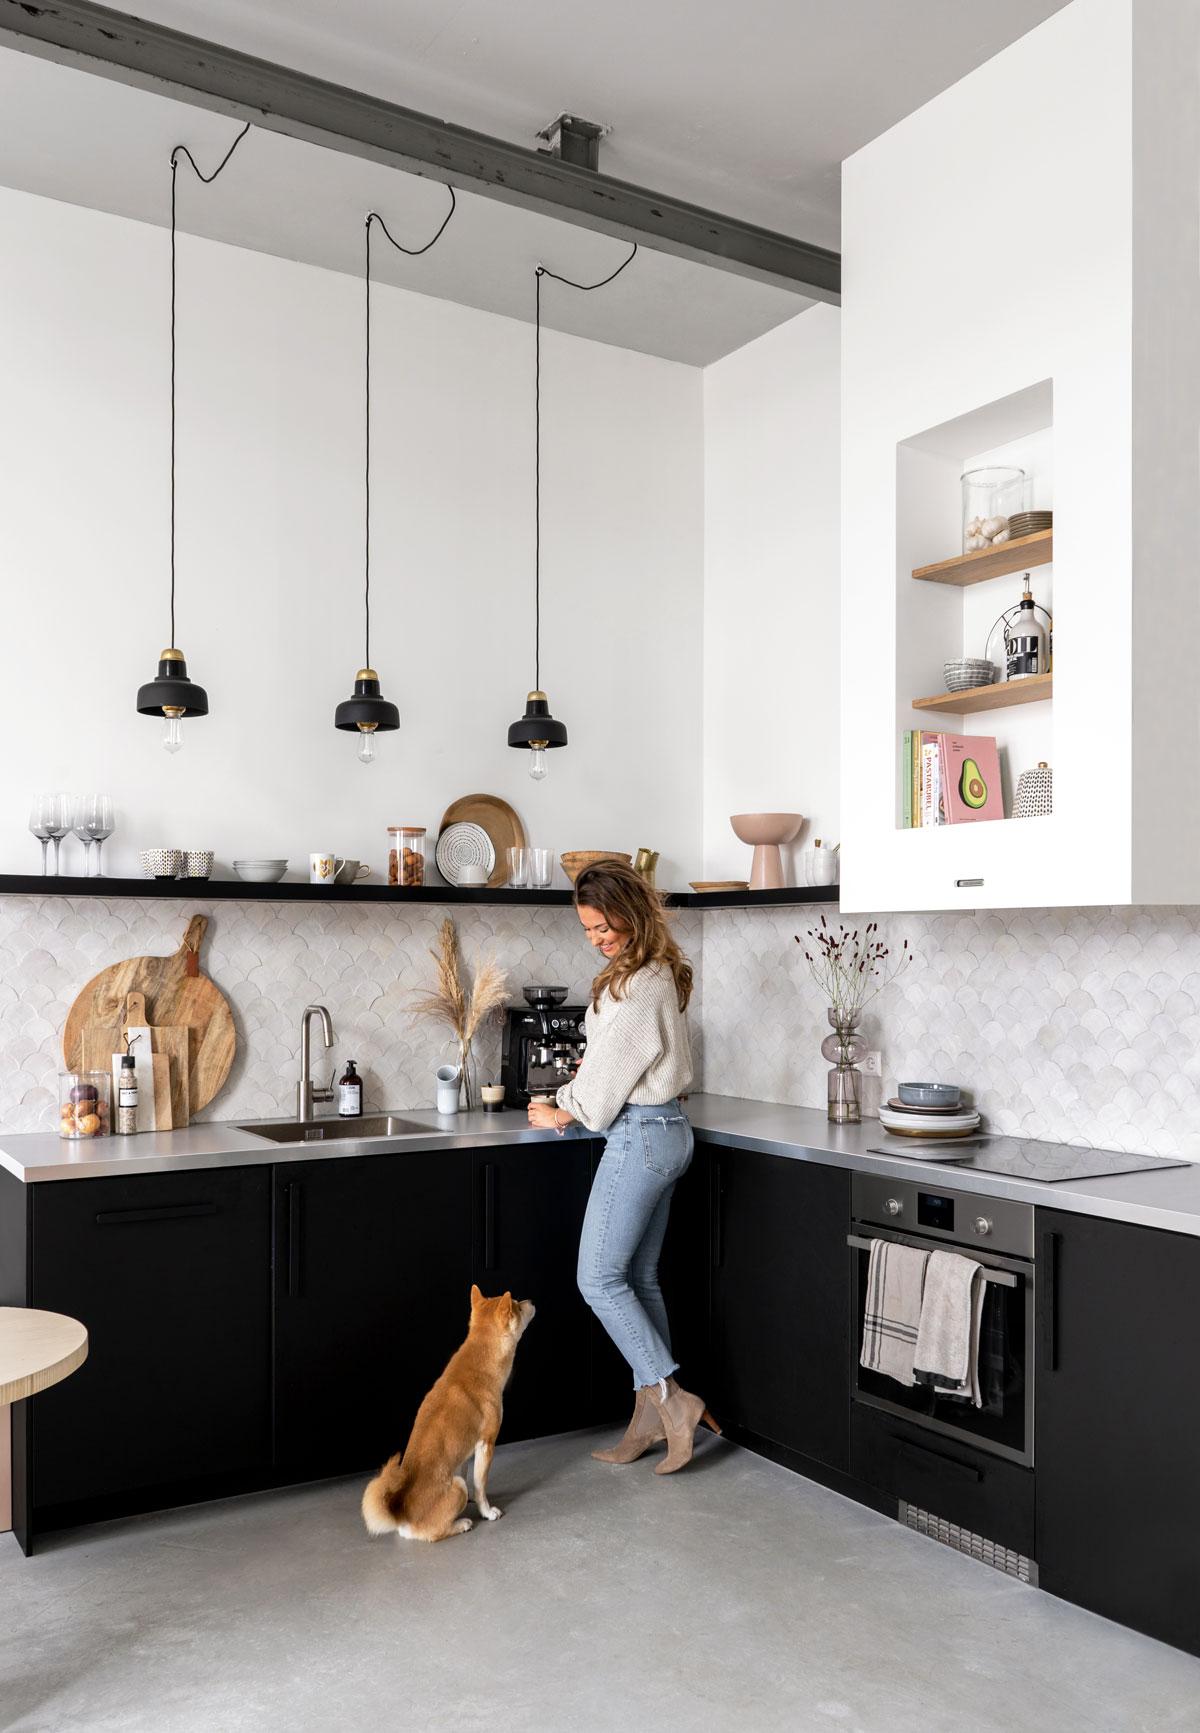 keuken stylingtips - Tanja van Hoogdalem